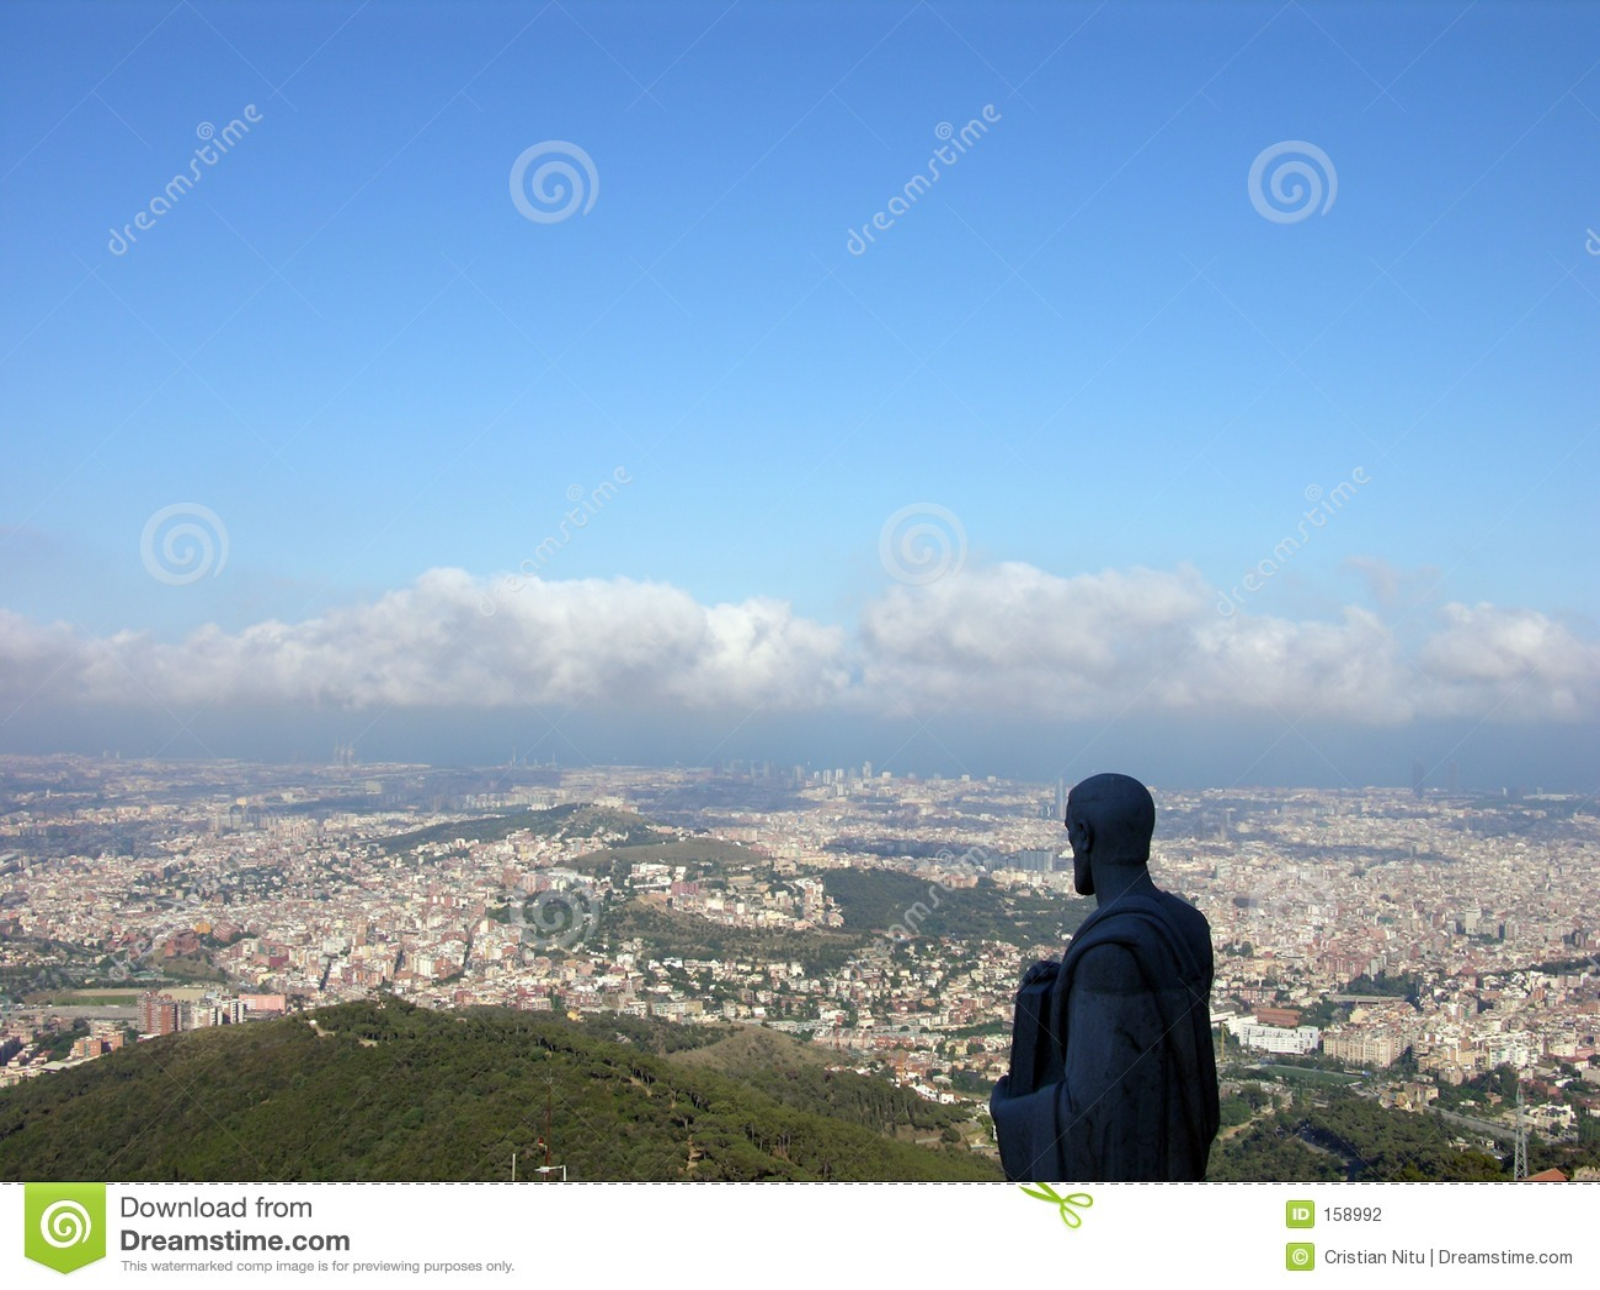 Statue Watching Barcelona